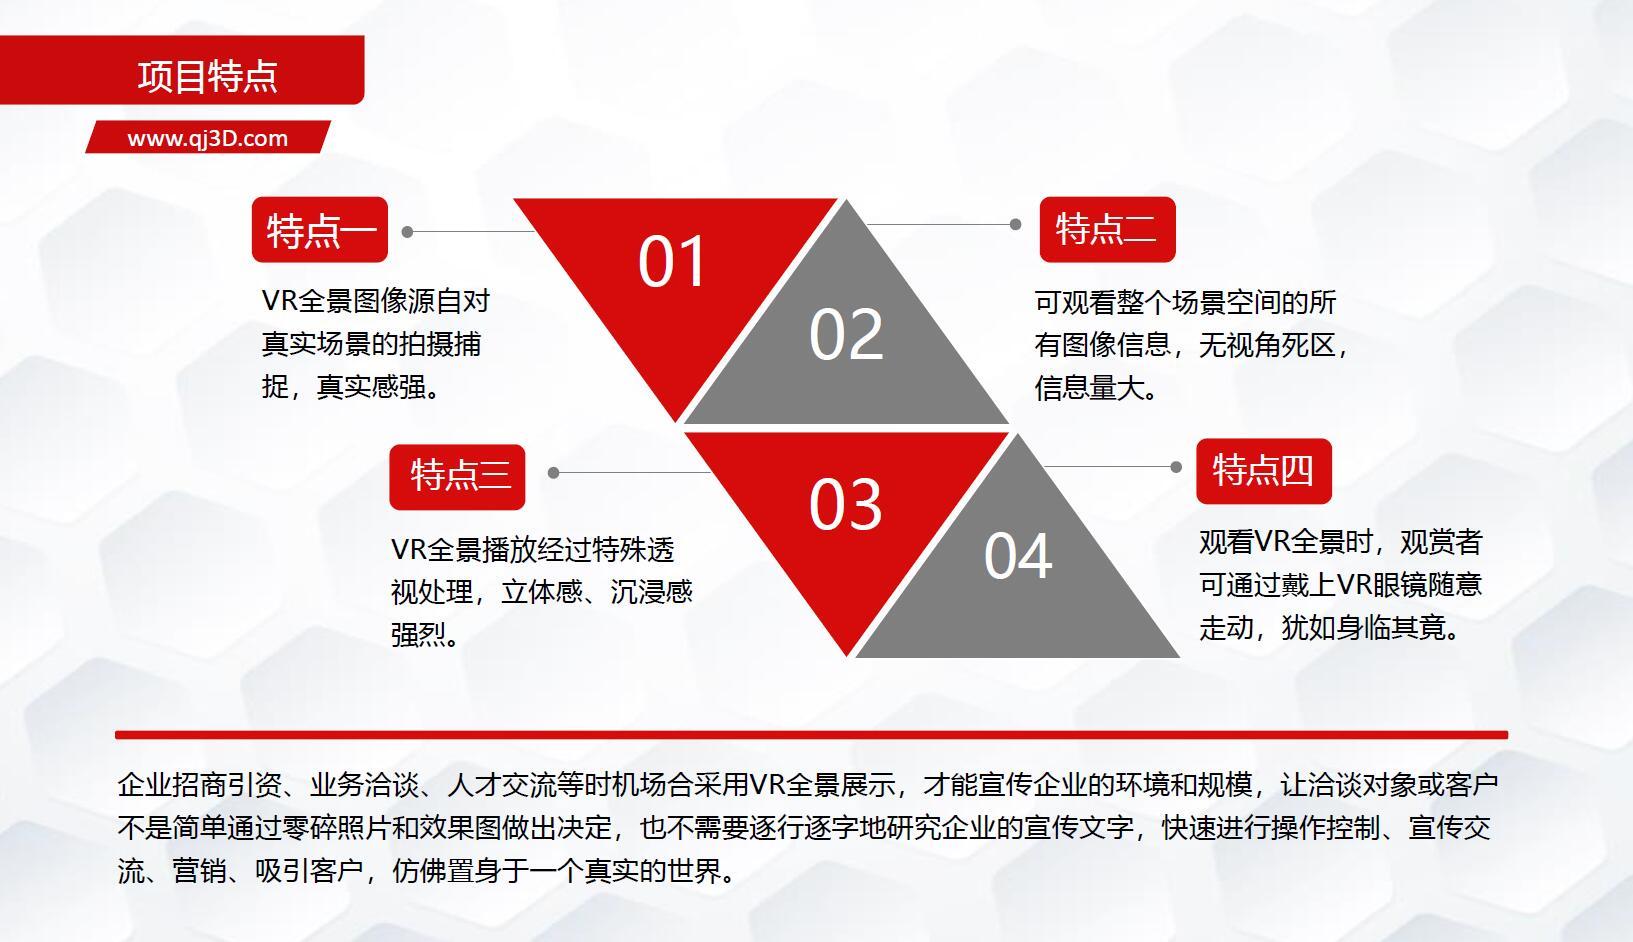 VR 全景互动平台特点  合作方案–深圳360全景